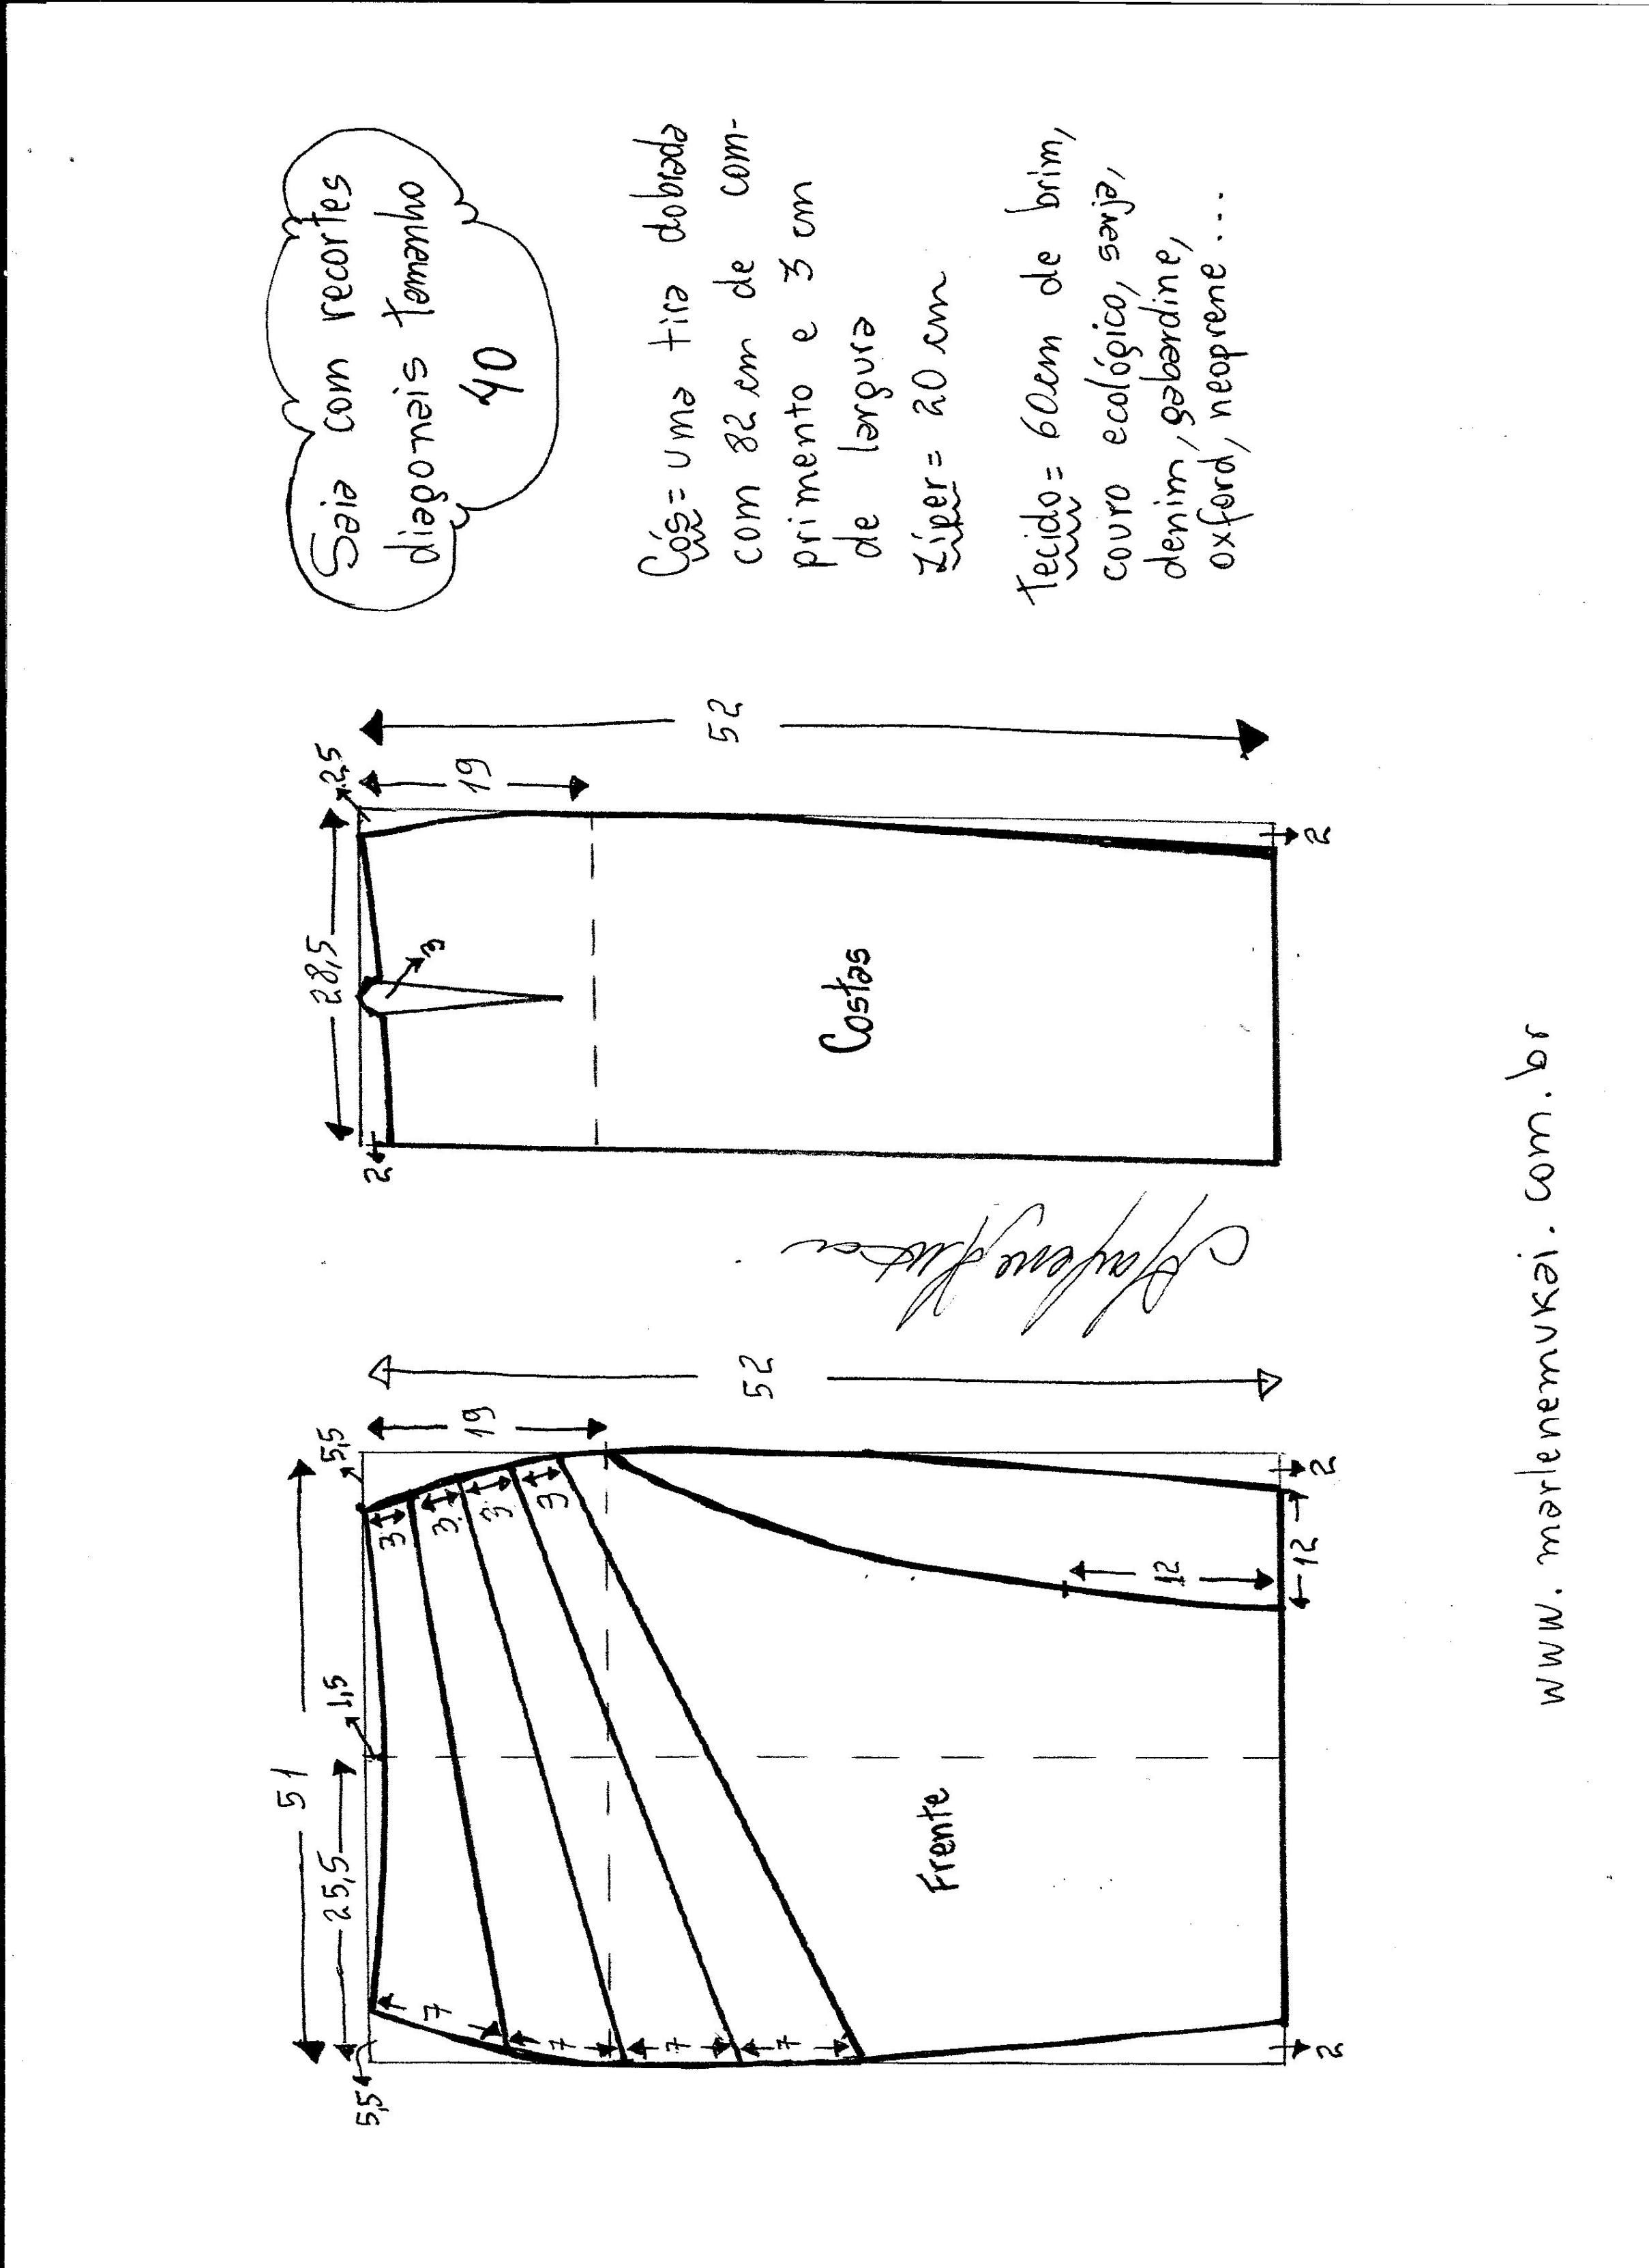 Patrón de Falda modelo clásico con corte diagonal | Patrones | Pinterest